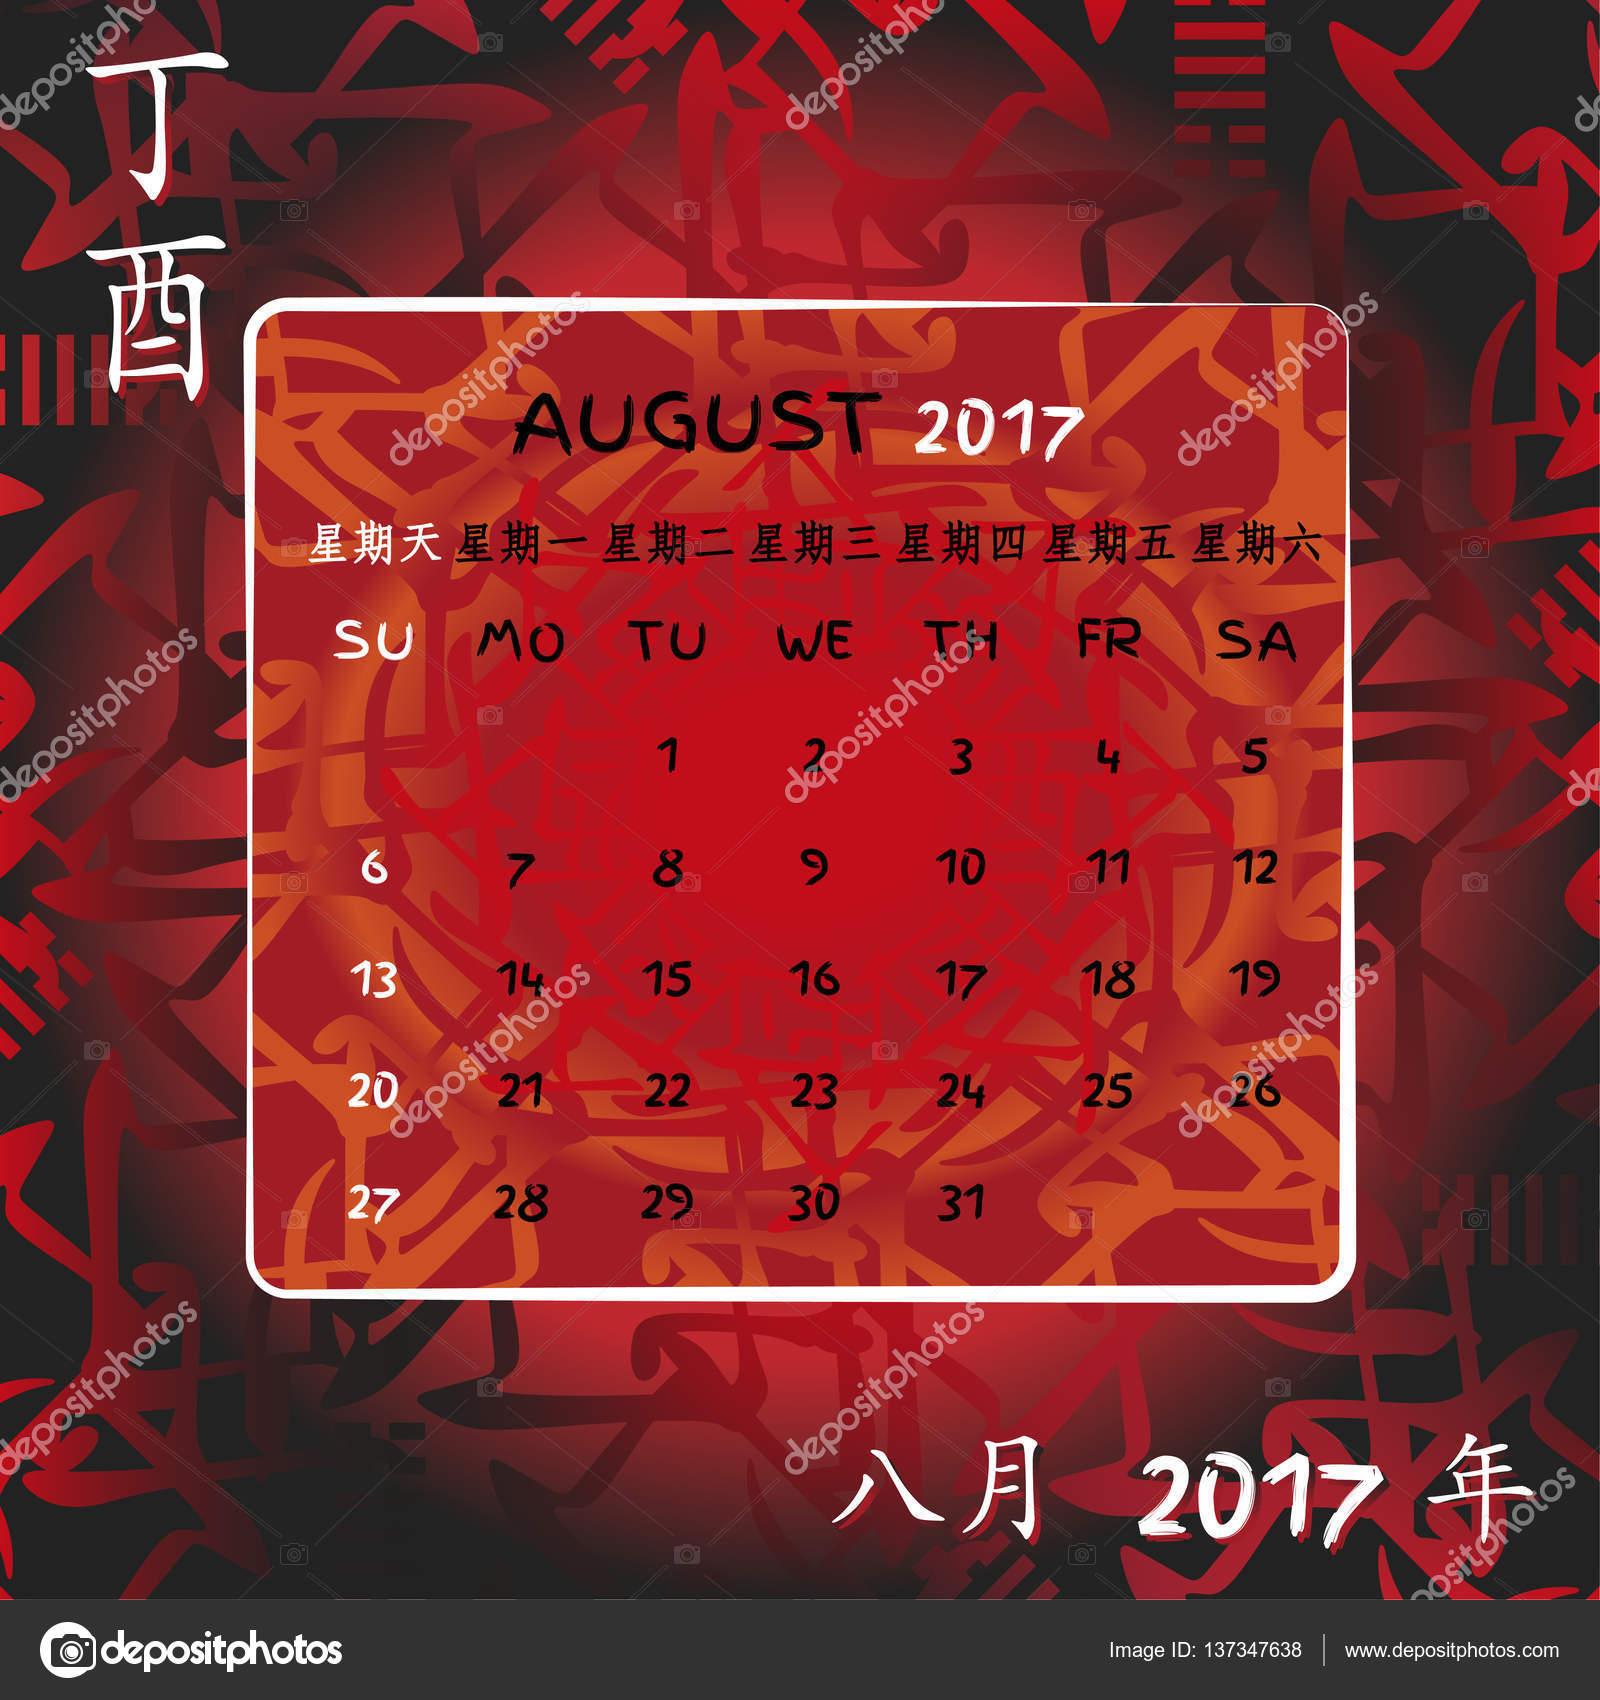 Calendario Traduzione Inglese.Vettore Feng Shui Calendario Feng Shui Calendario Della